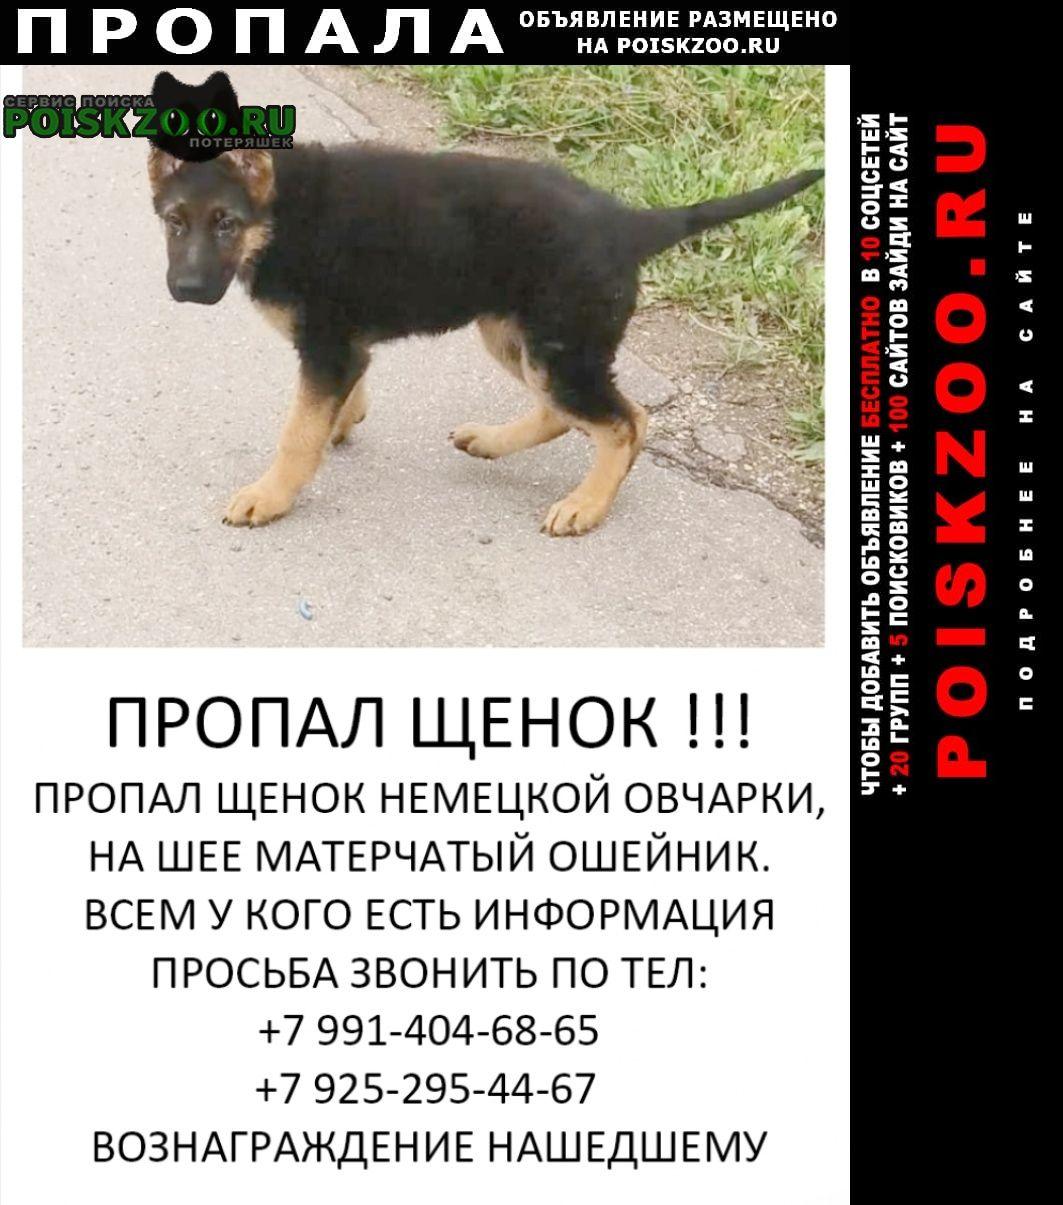 Пропала собака кобель щенок немецкой овчарки Лобня